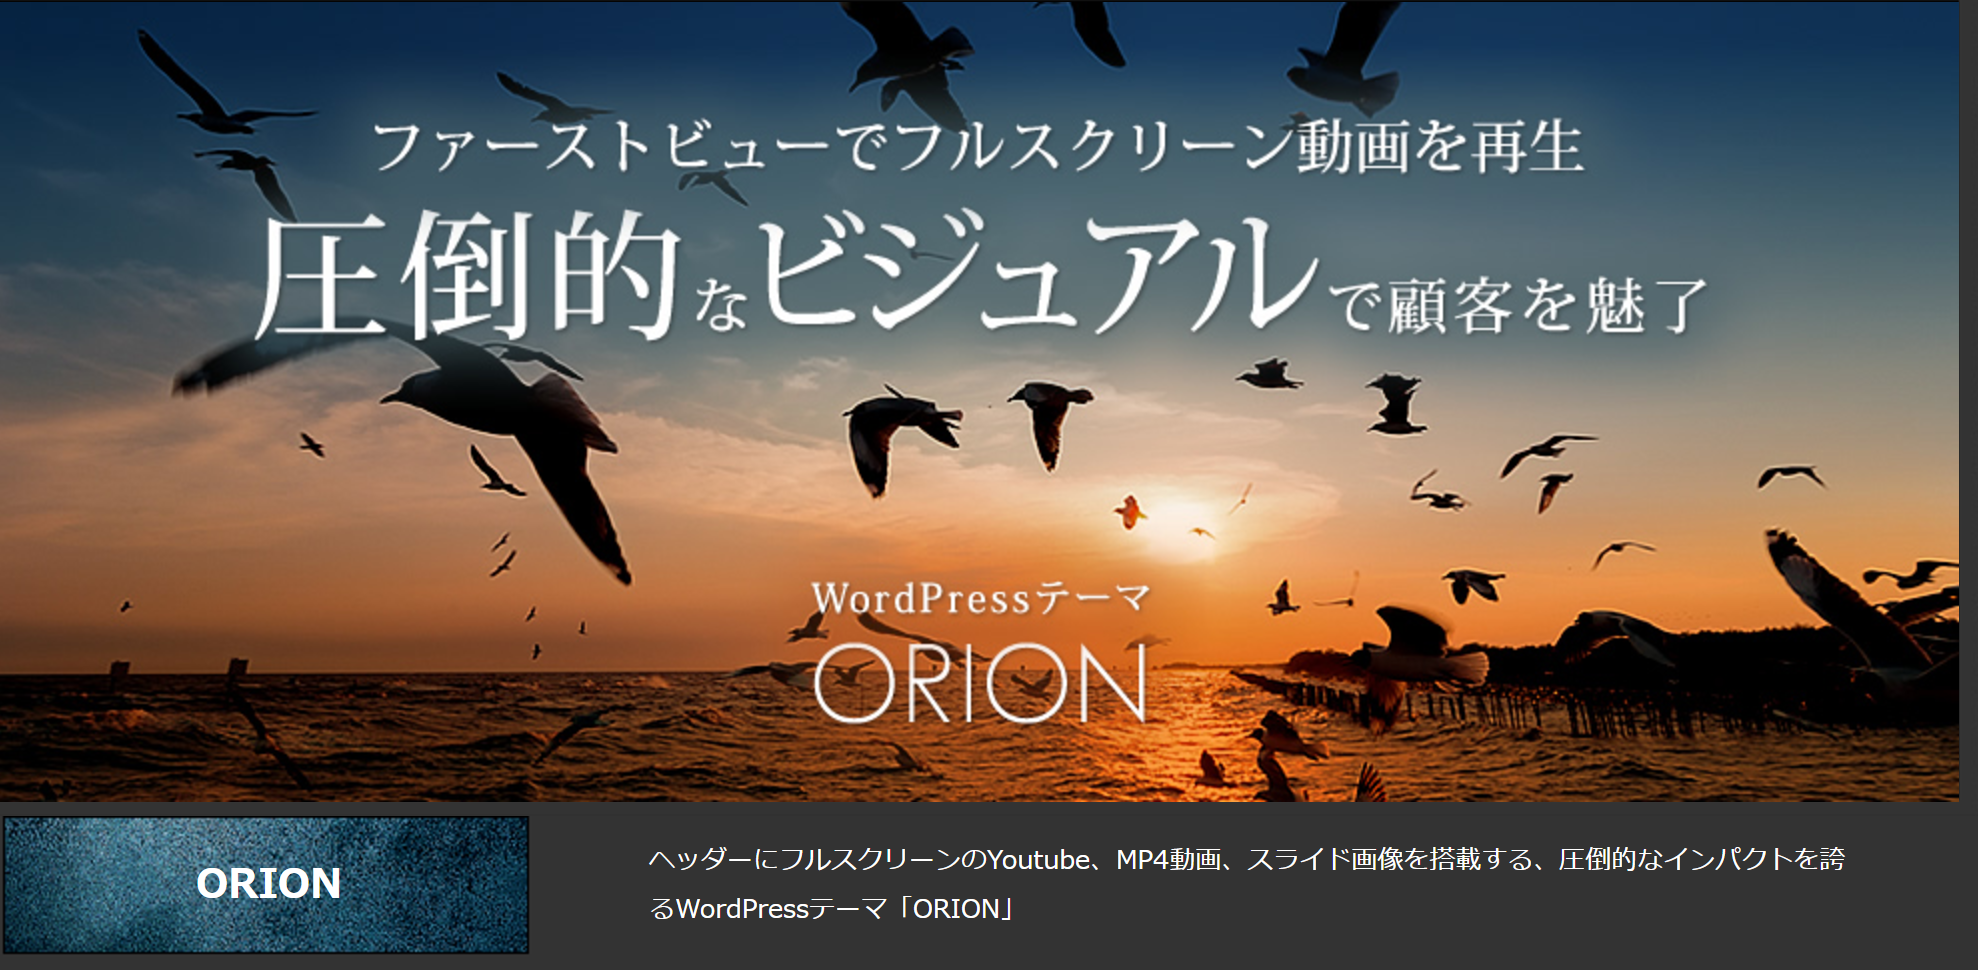 orion - WordPressの有料テーマを使うメリットと初心者におすすめ15選を紹介